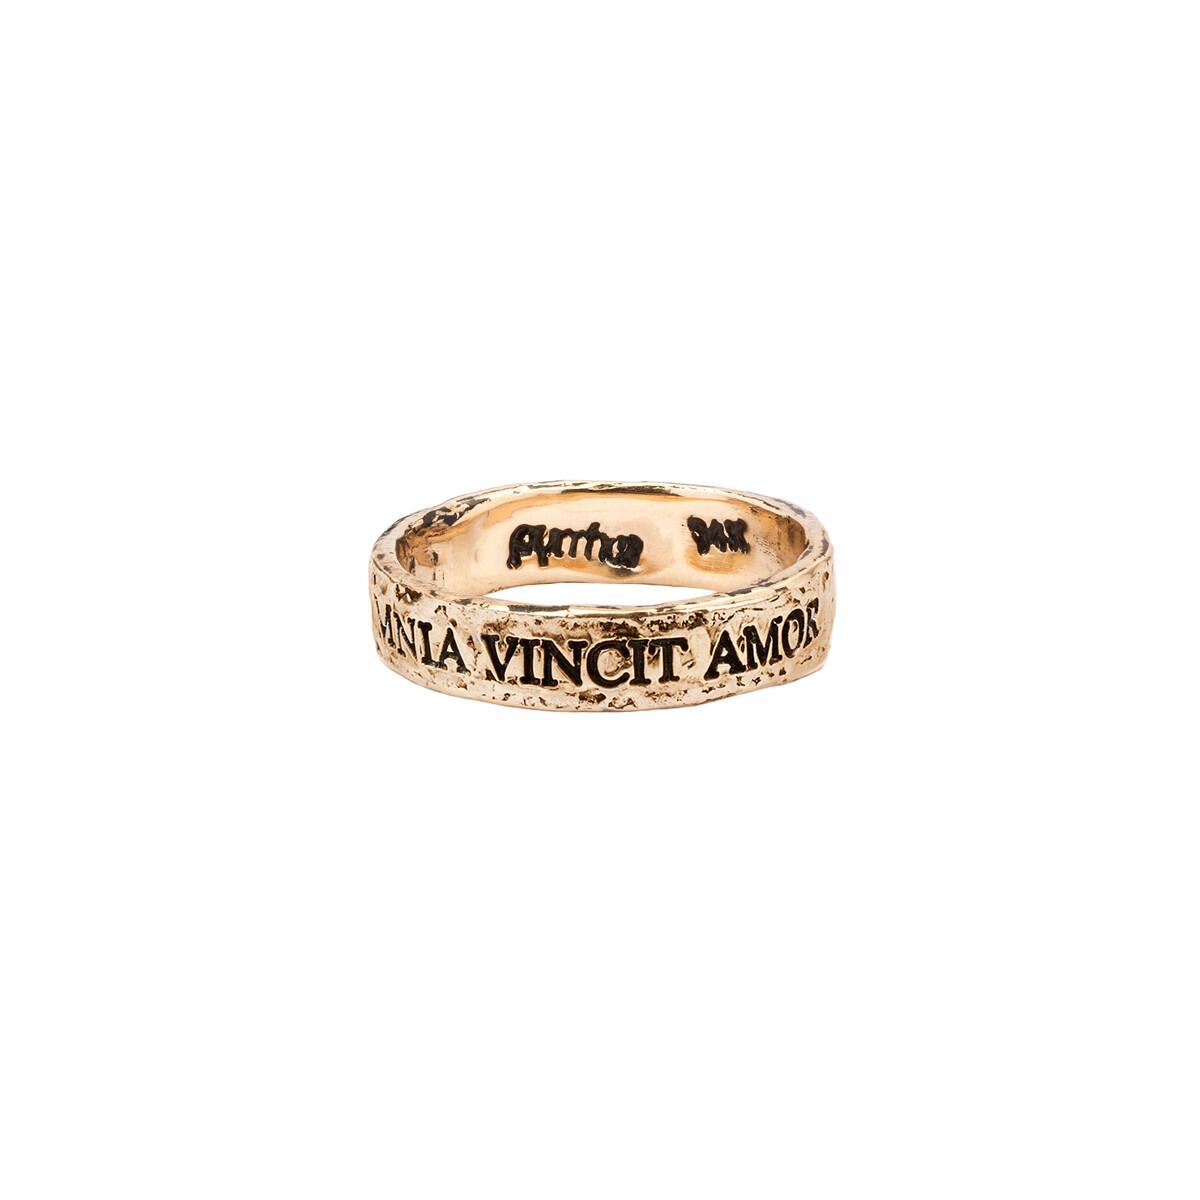 14Kt PYRRAH Latin Motto Band Ring